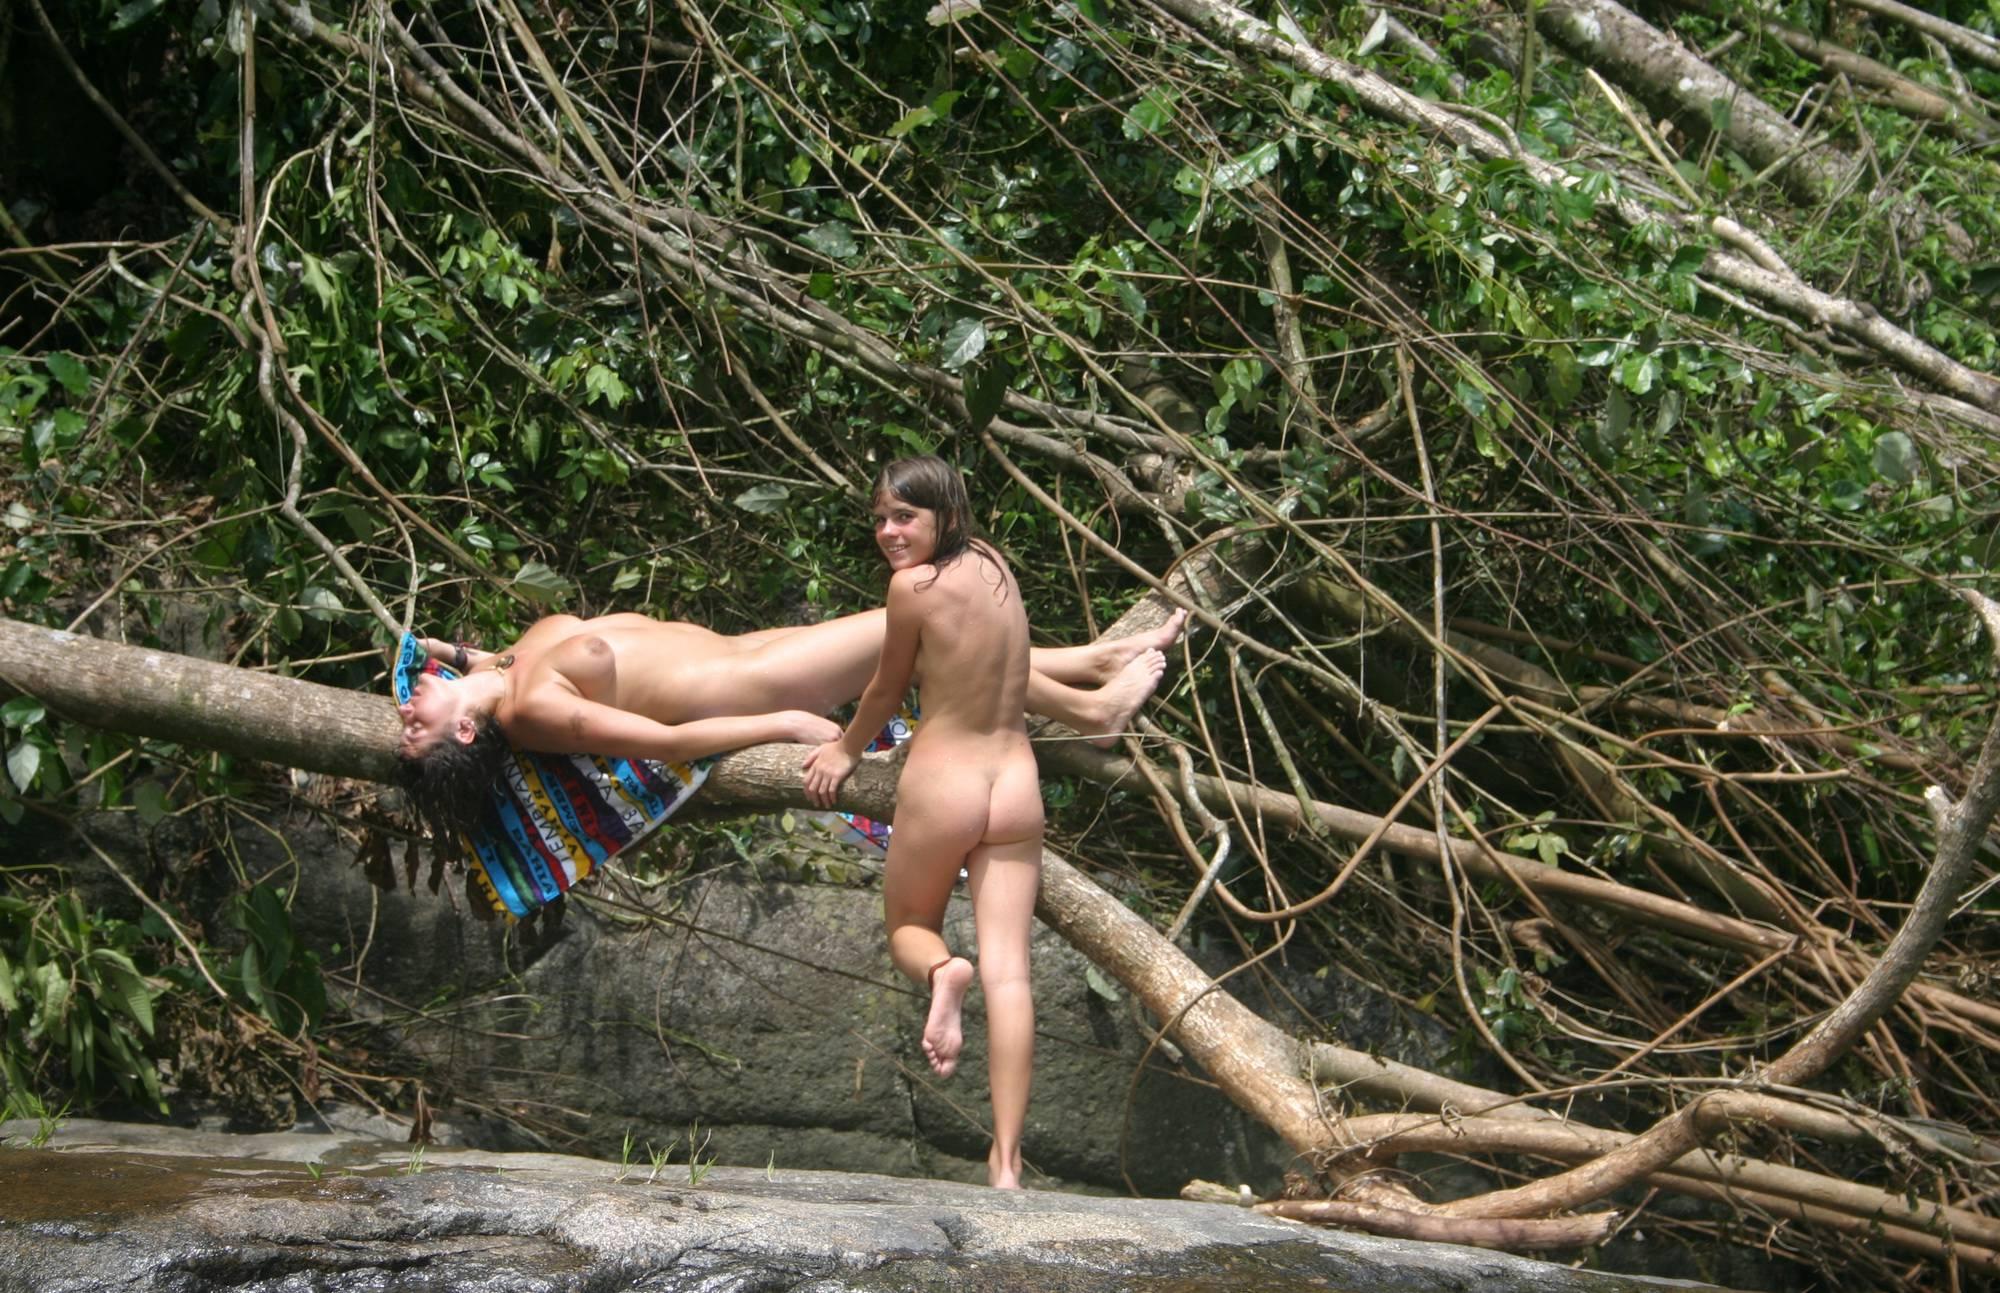 Nudist Pics Brazilian Top of the Rivers - 1